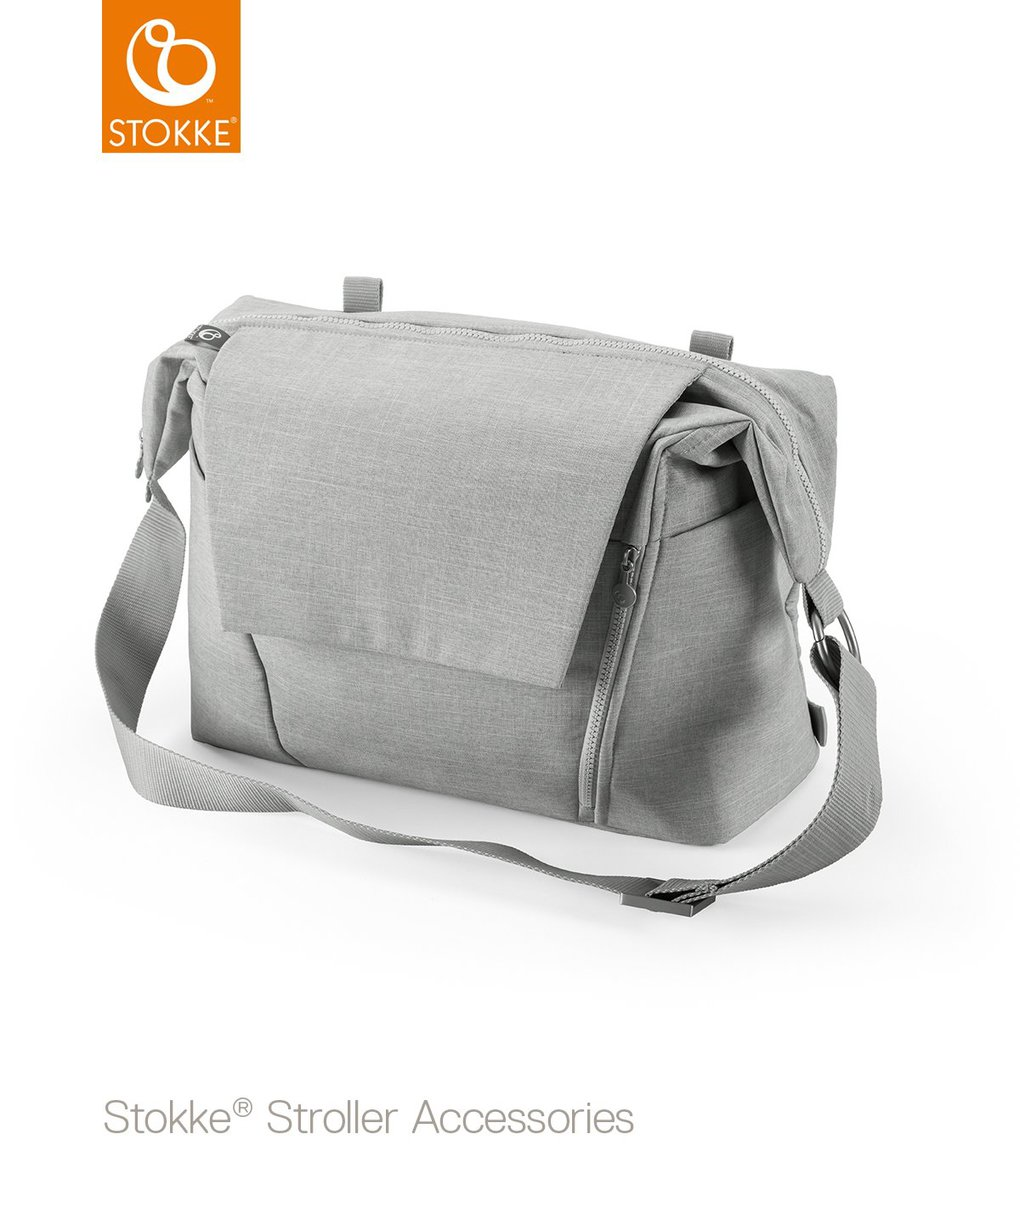 Stokke® borsa per il cambio - grey melange - Stokke